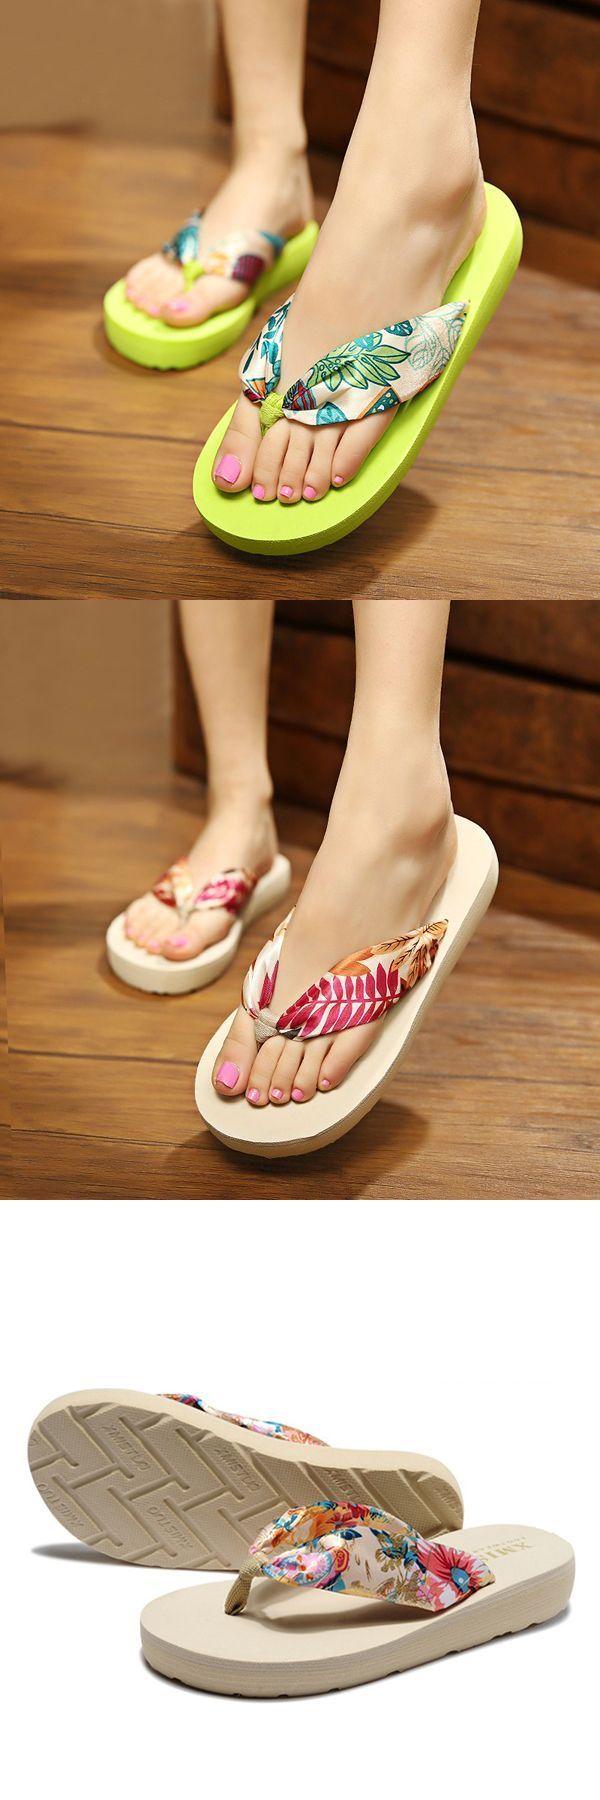 408cb06aa110 Big size summer women beach slippers bohemia flip flops breathable silk slippers  slippers o neil  slippers  knitting  pattern  slippers  of  spider ...